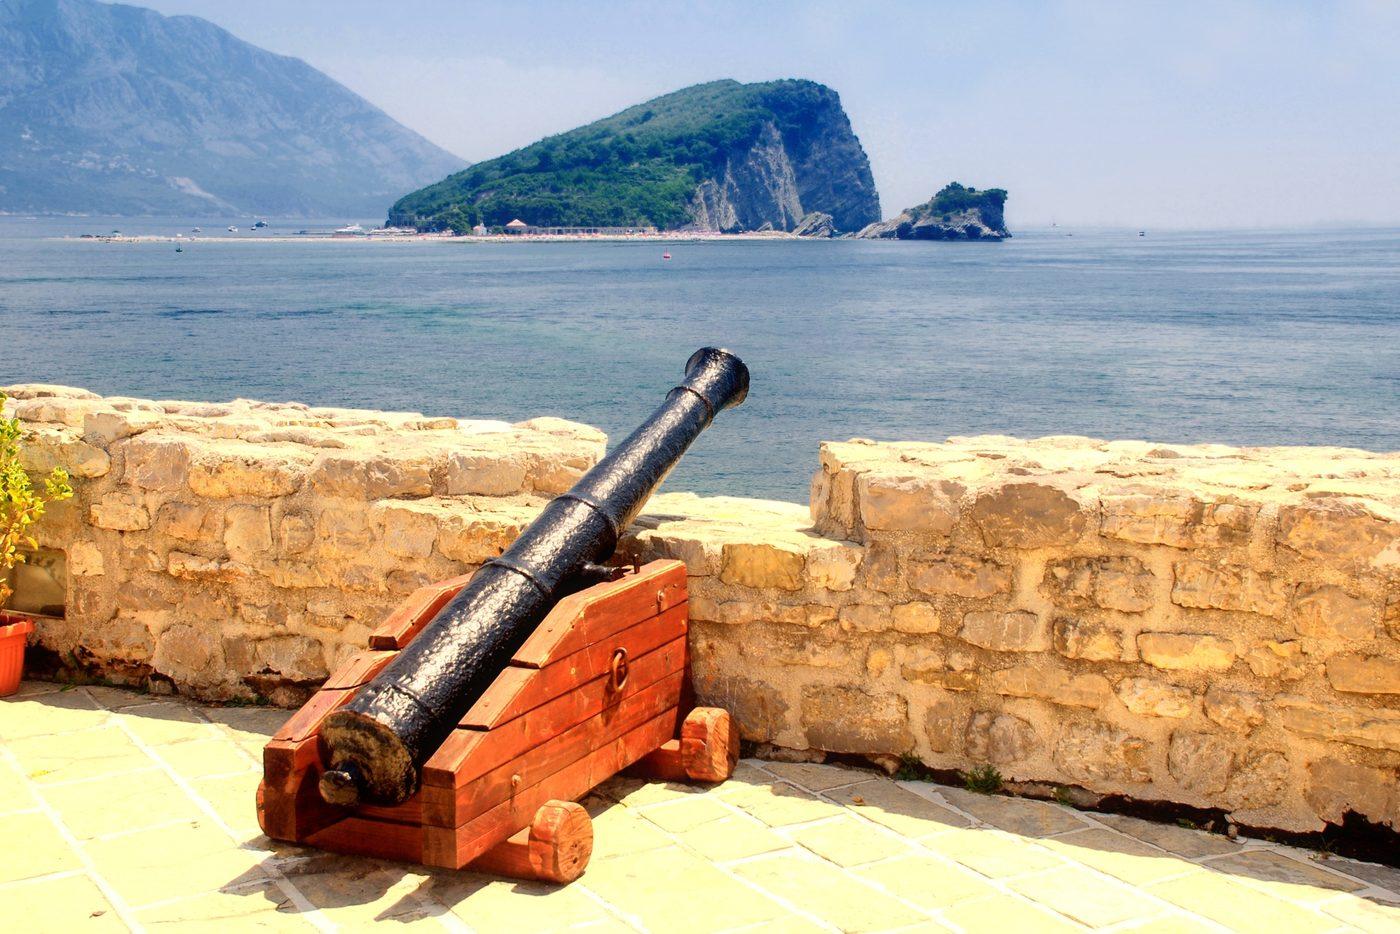 The Old Town of Dubrovnik on Croatia's coastline